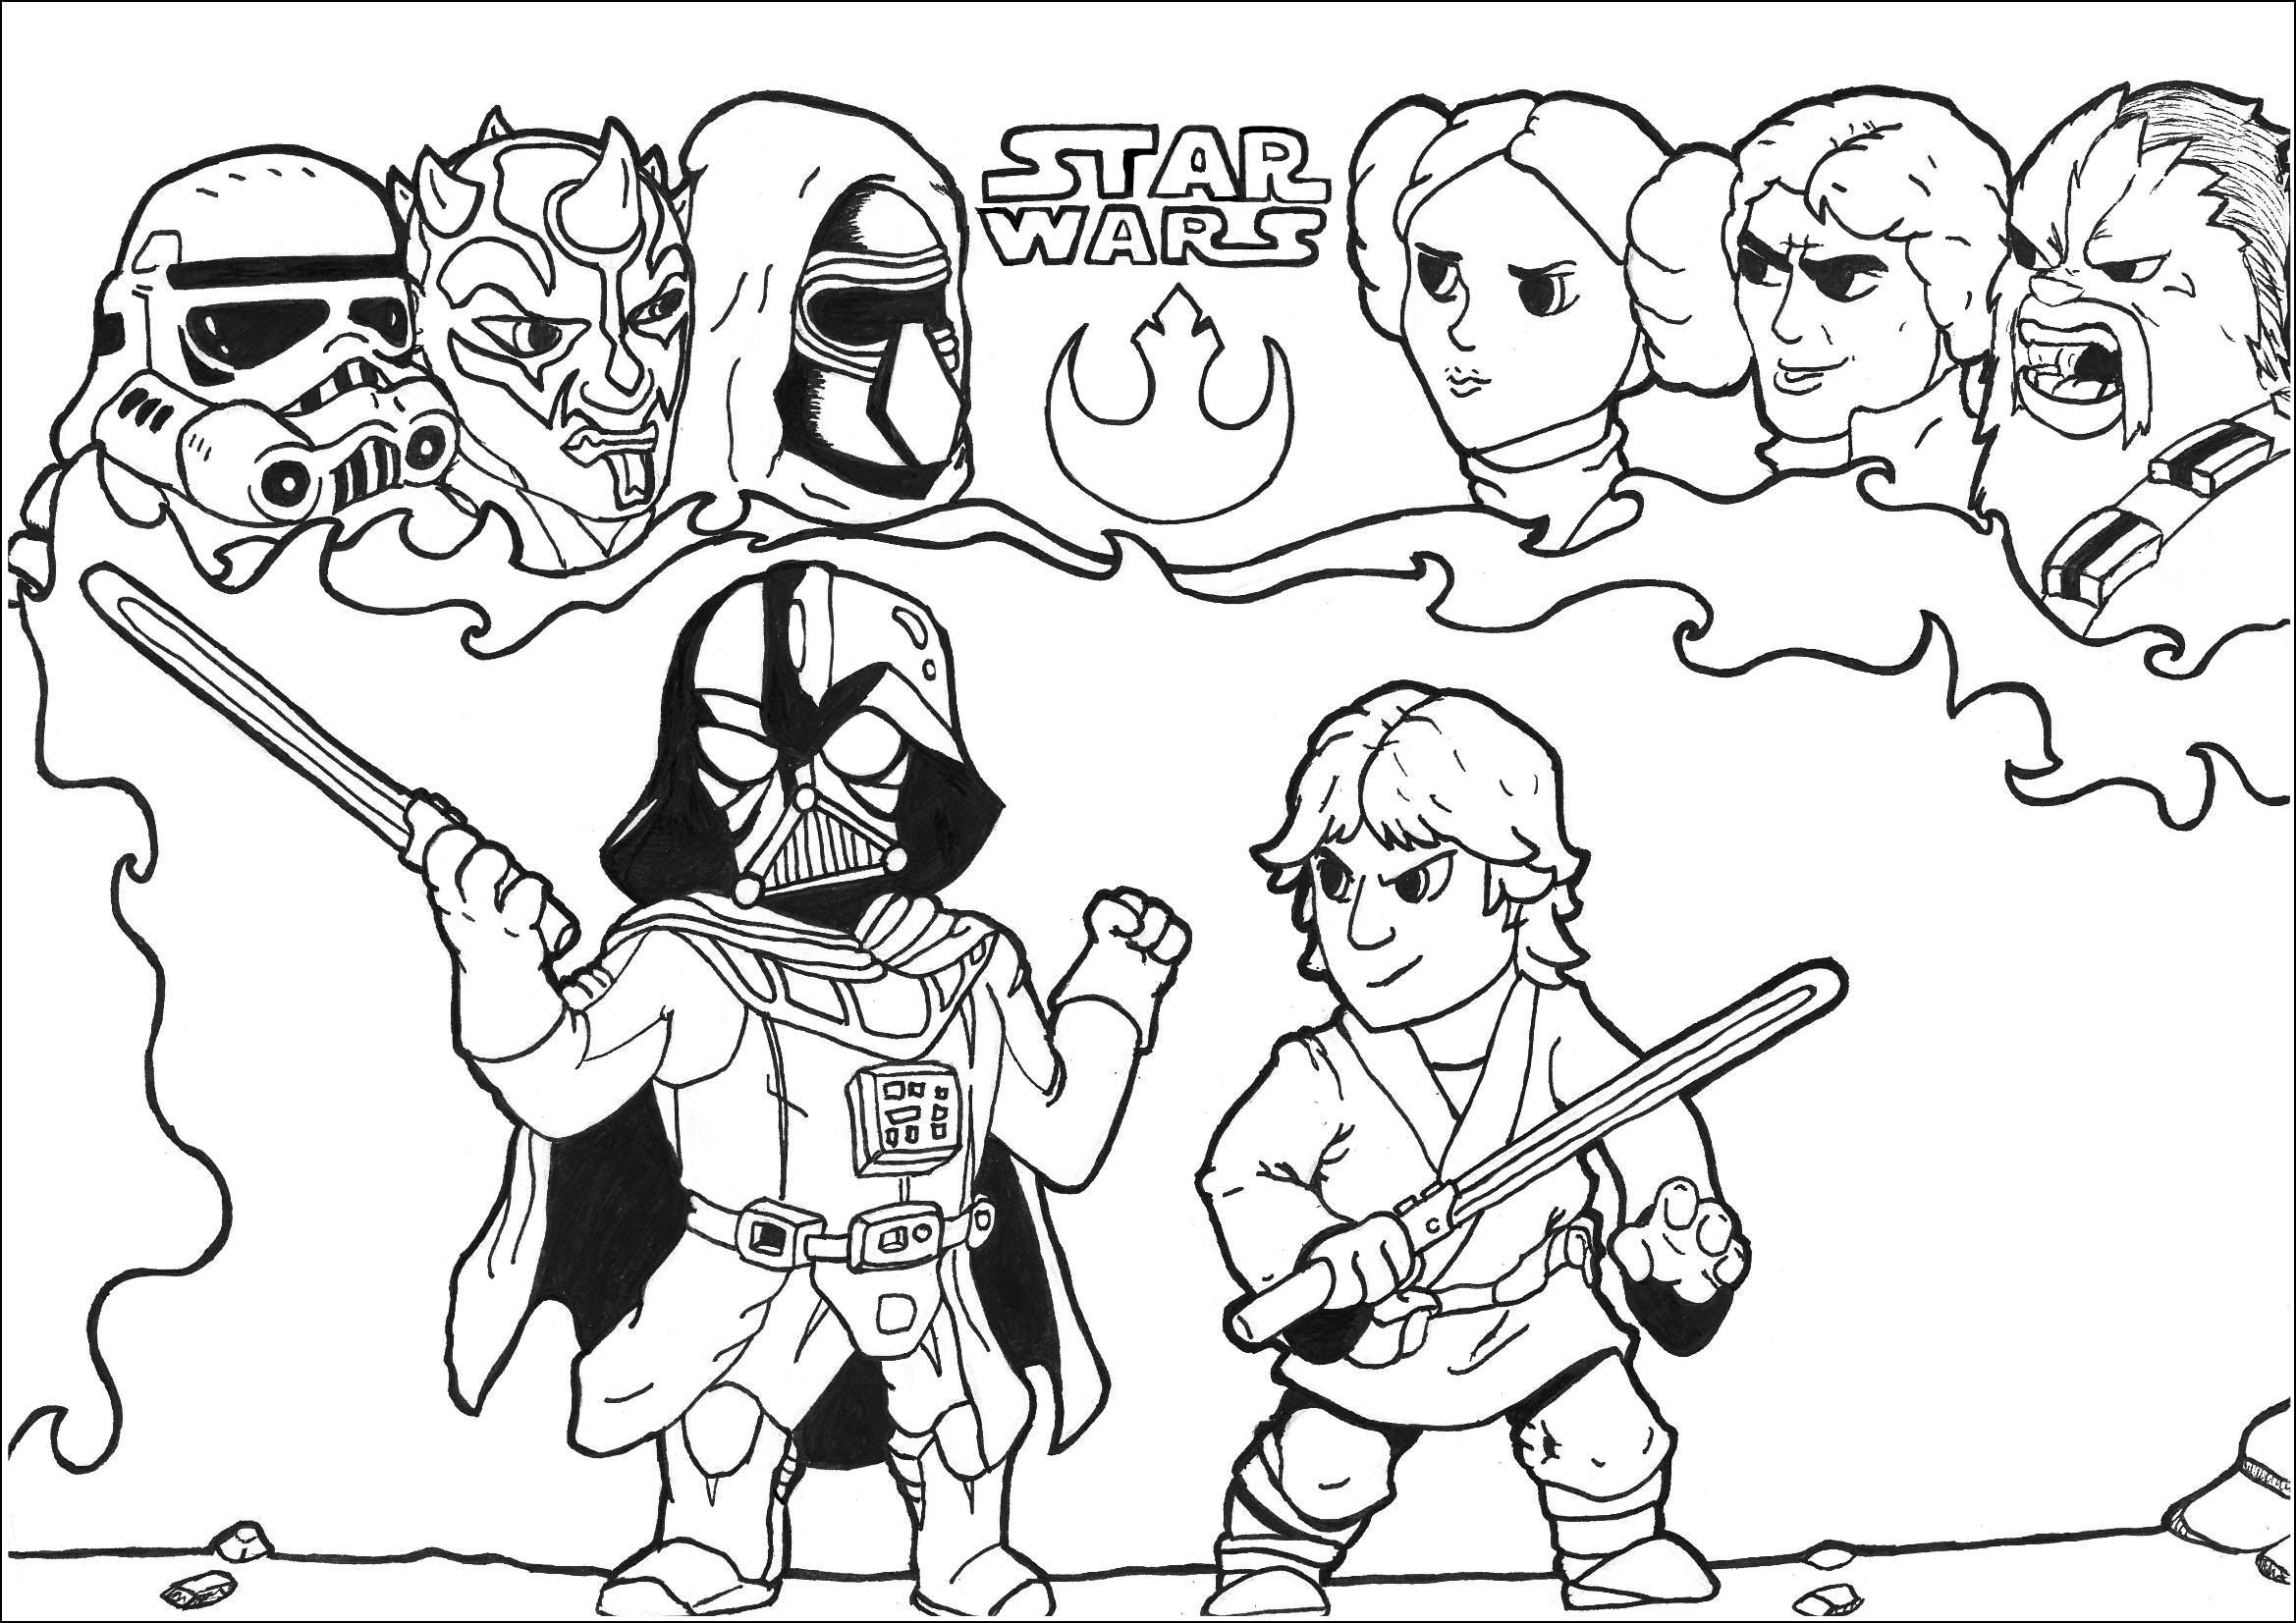 Star Wars Free To Color For Kids - Star Wars Kids Coloring intérieur Dessin A Colorier Star Wars Gratuit